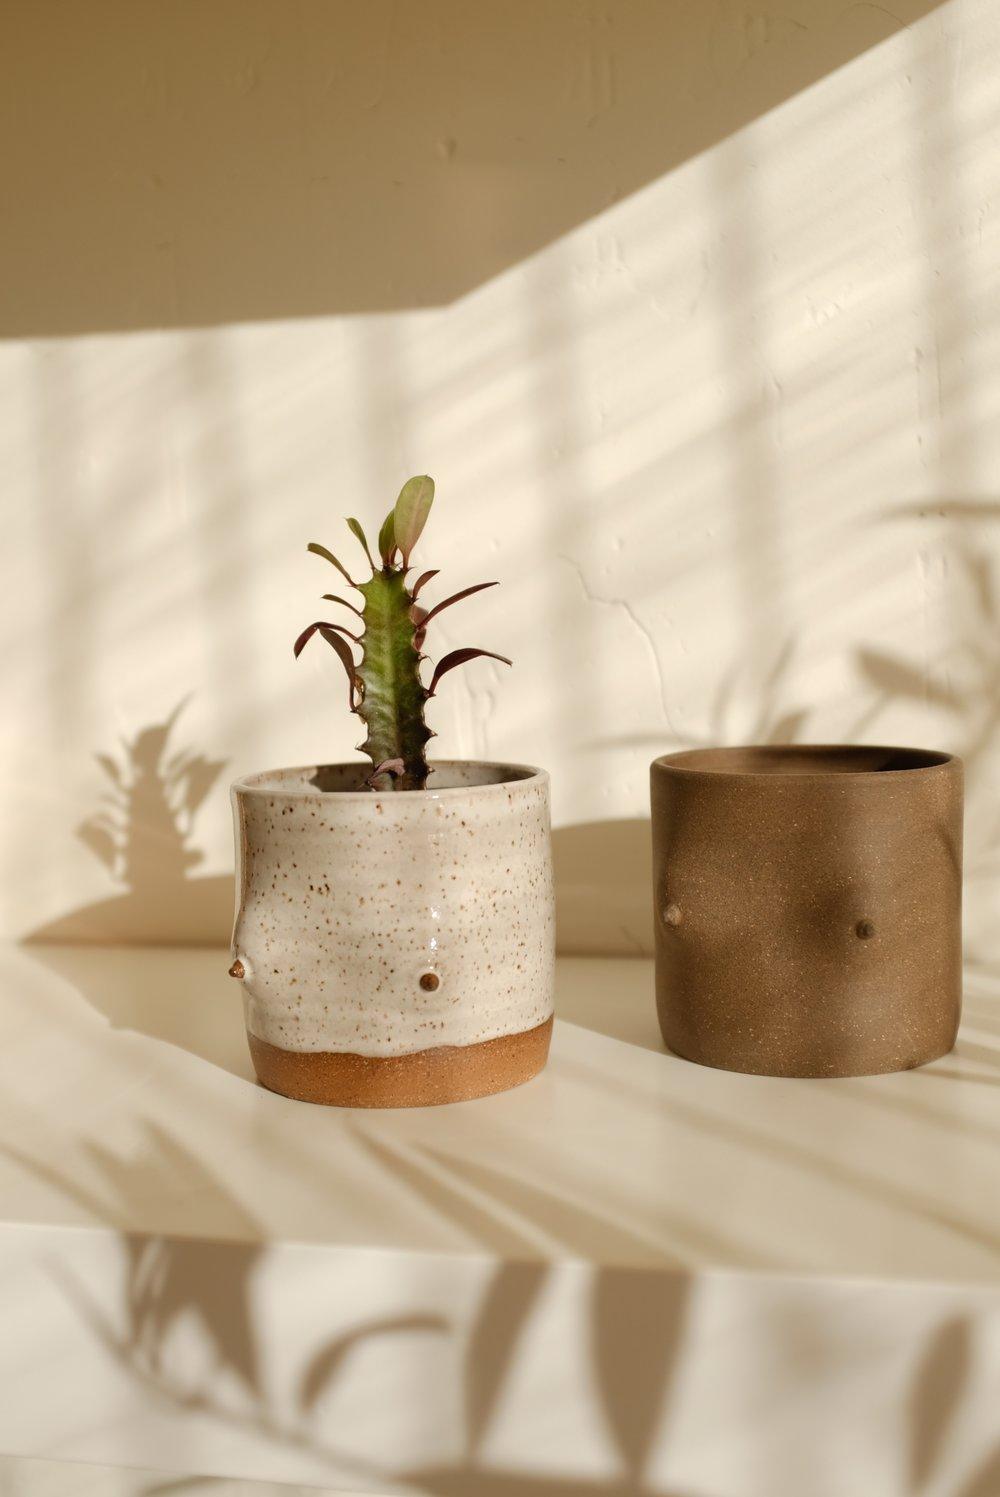 Boob Planter - $44